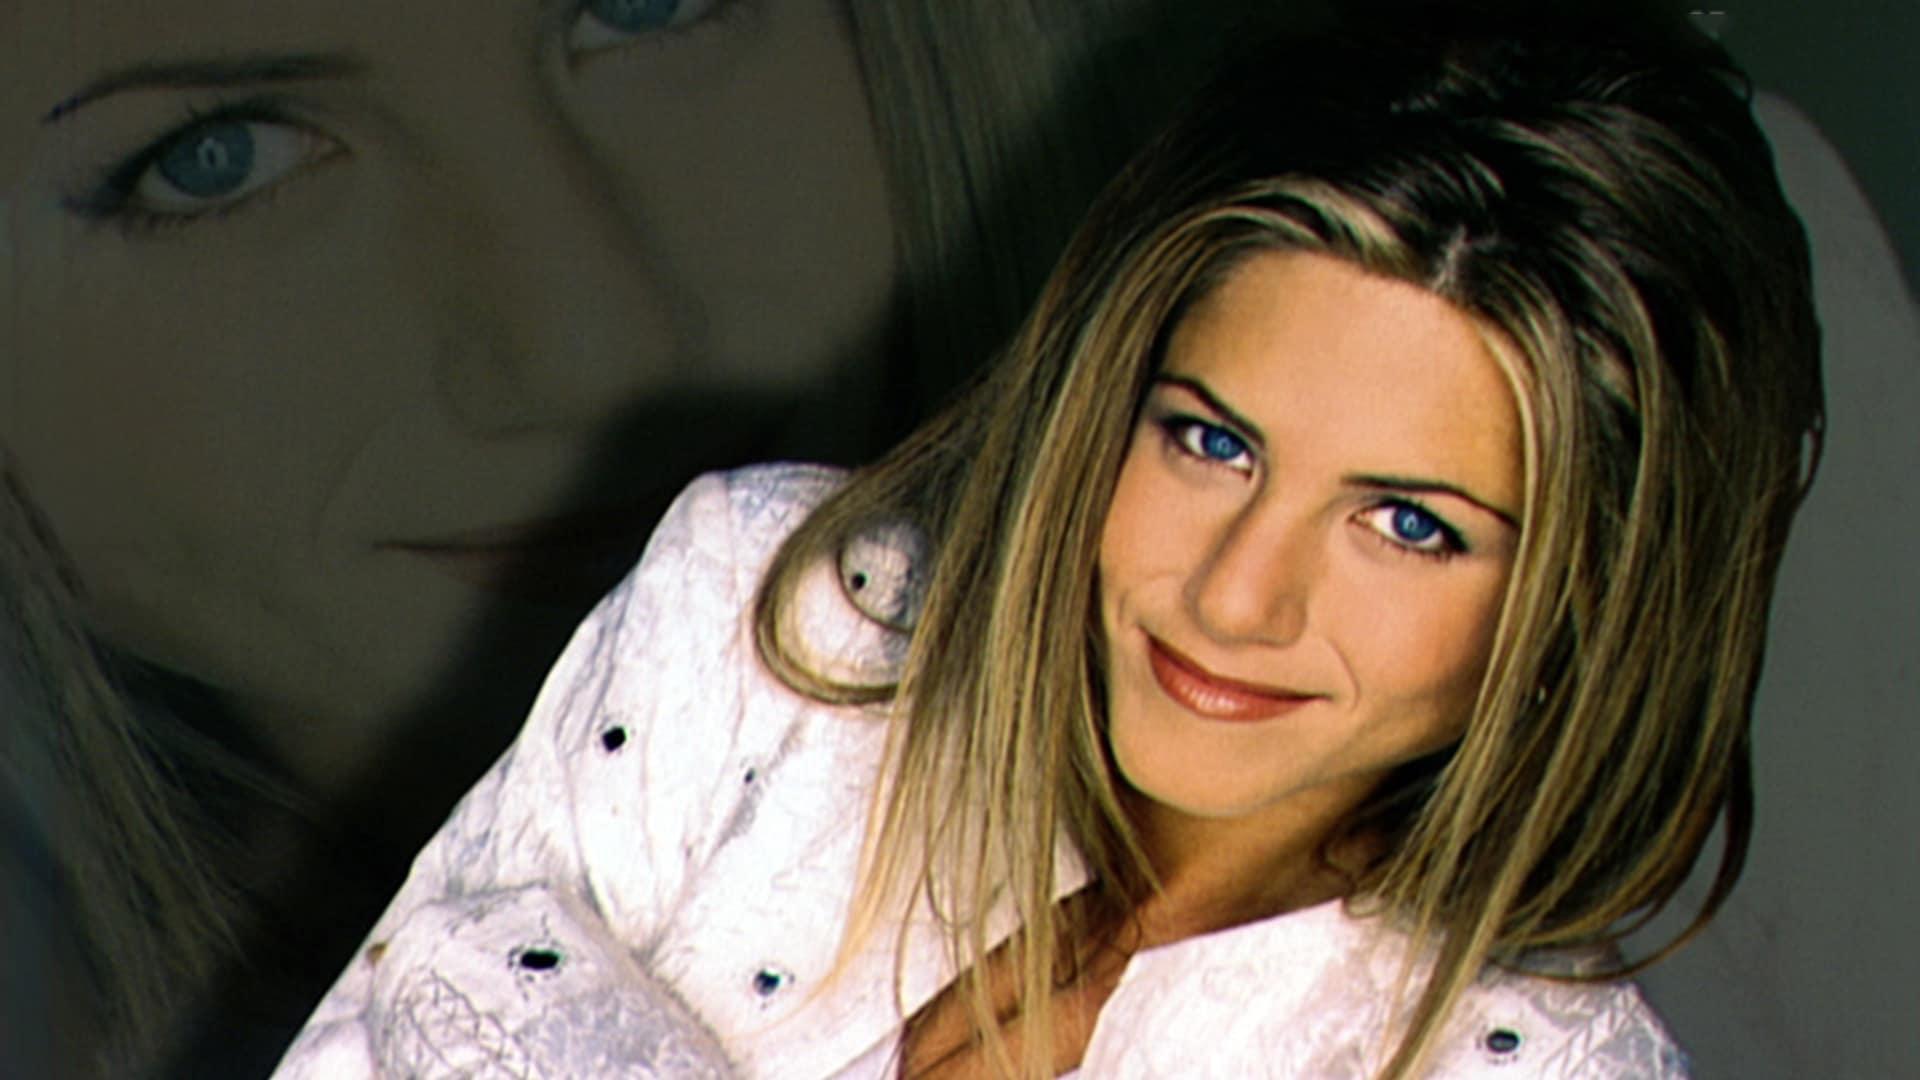 Jennifer Aniston: November 20, 1999